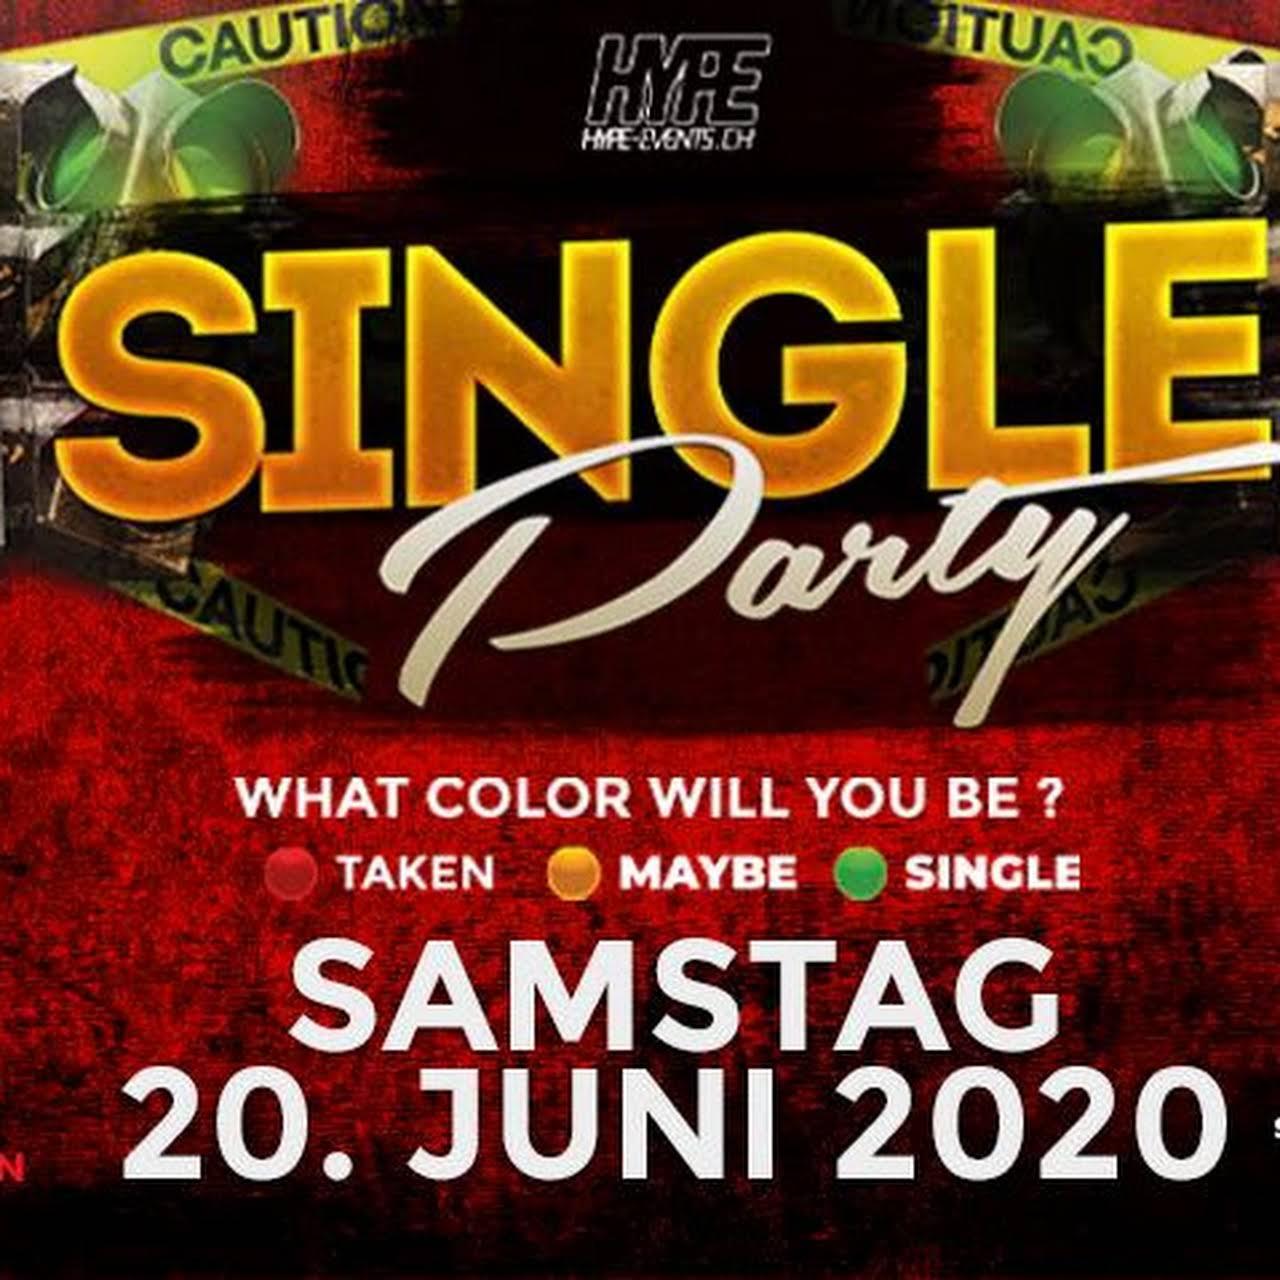 Basel, Switzerland Male Escorts Rentmen Partys